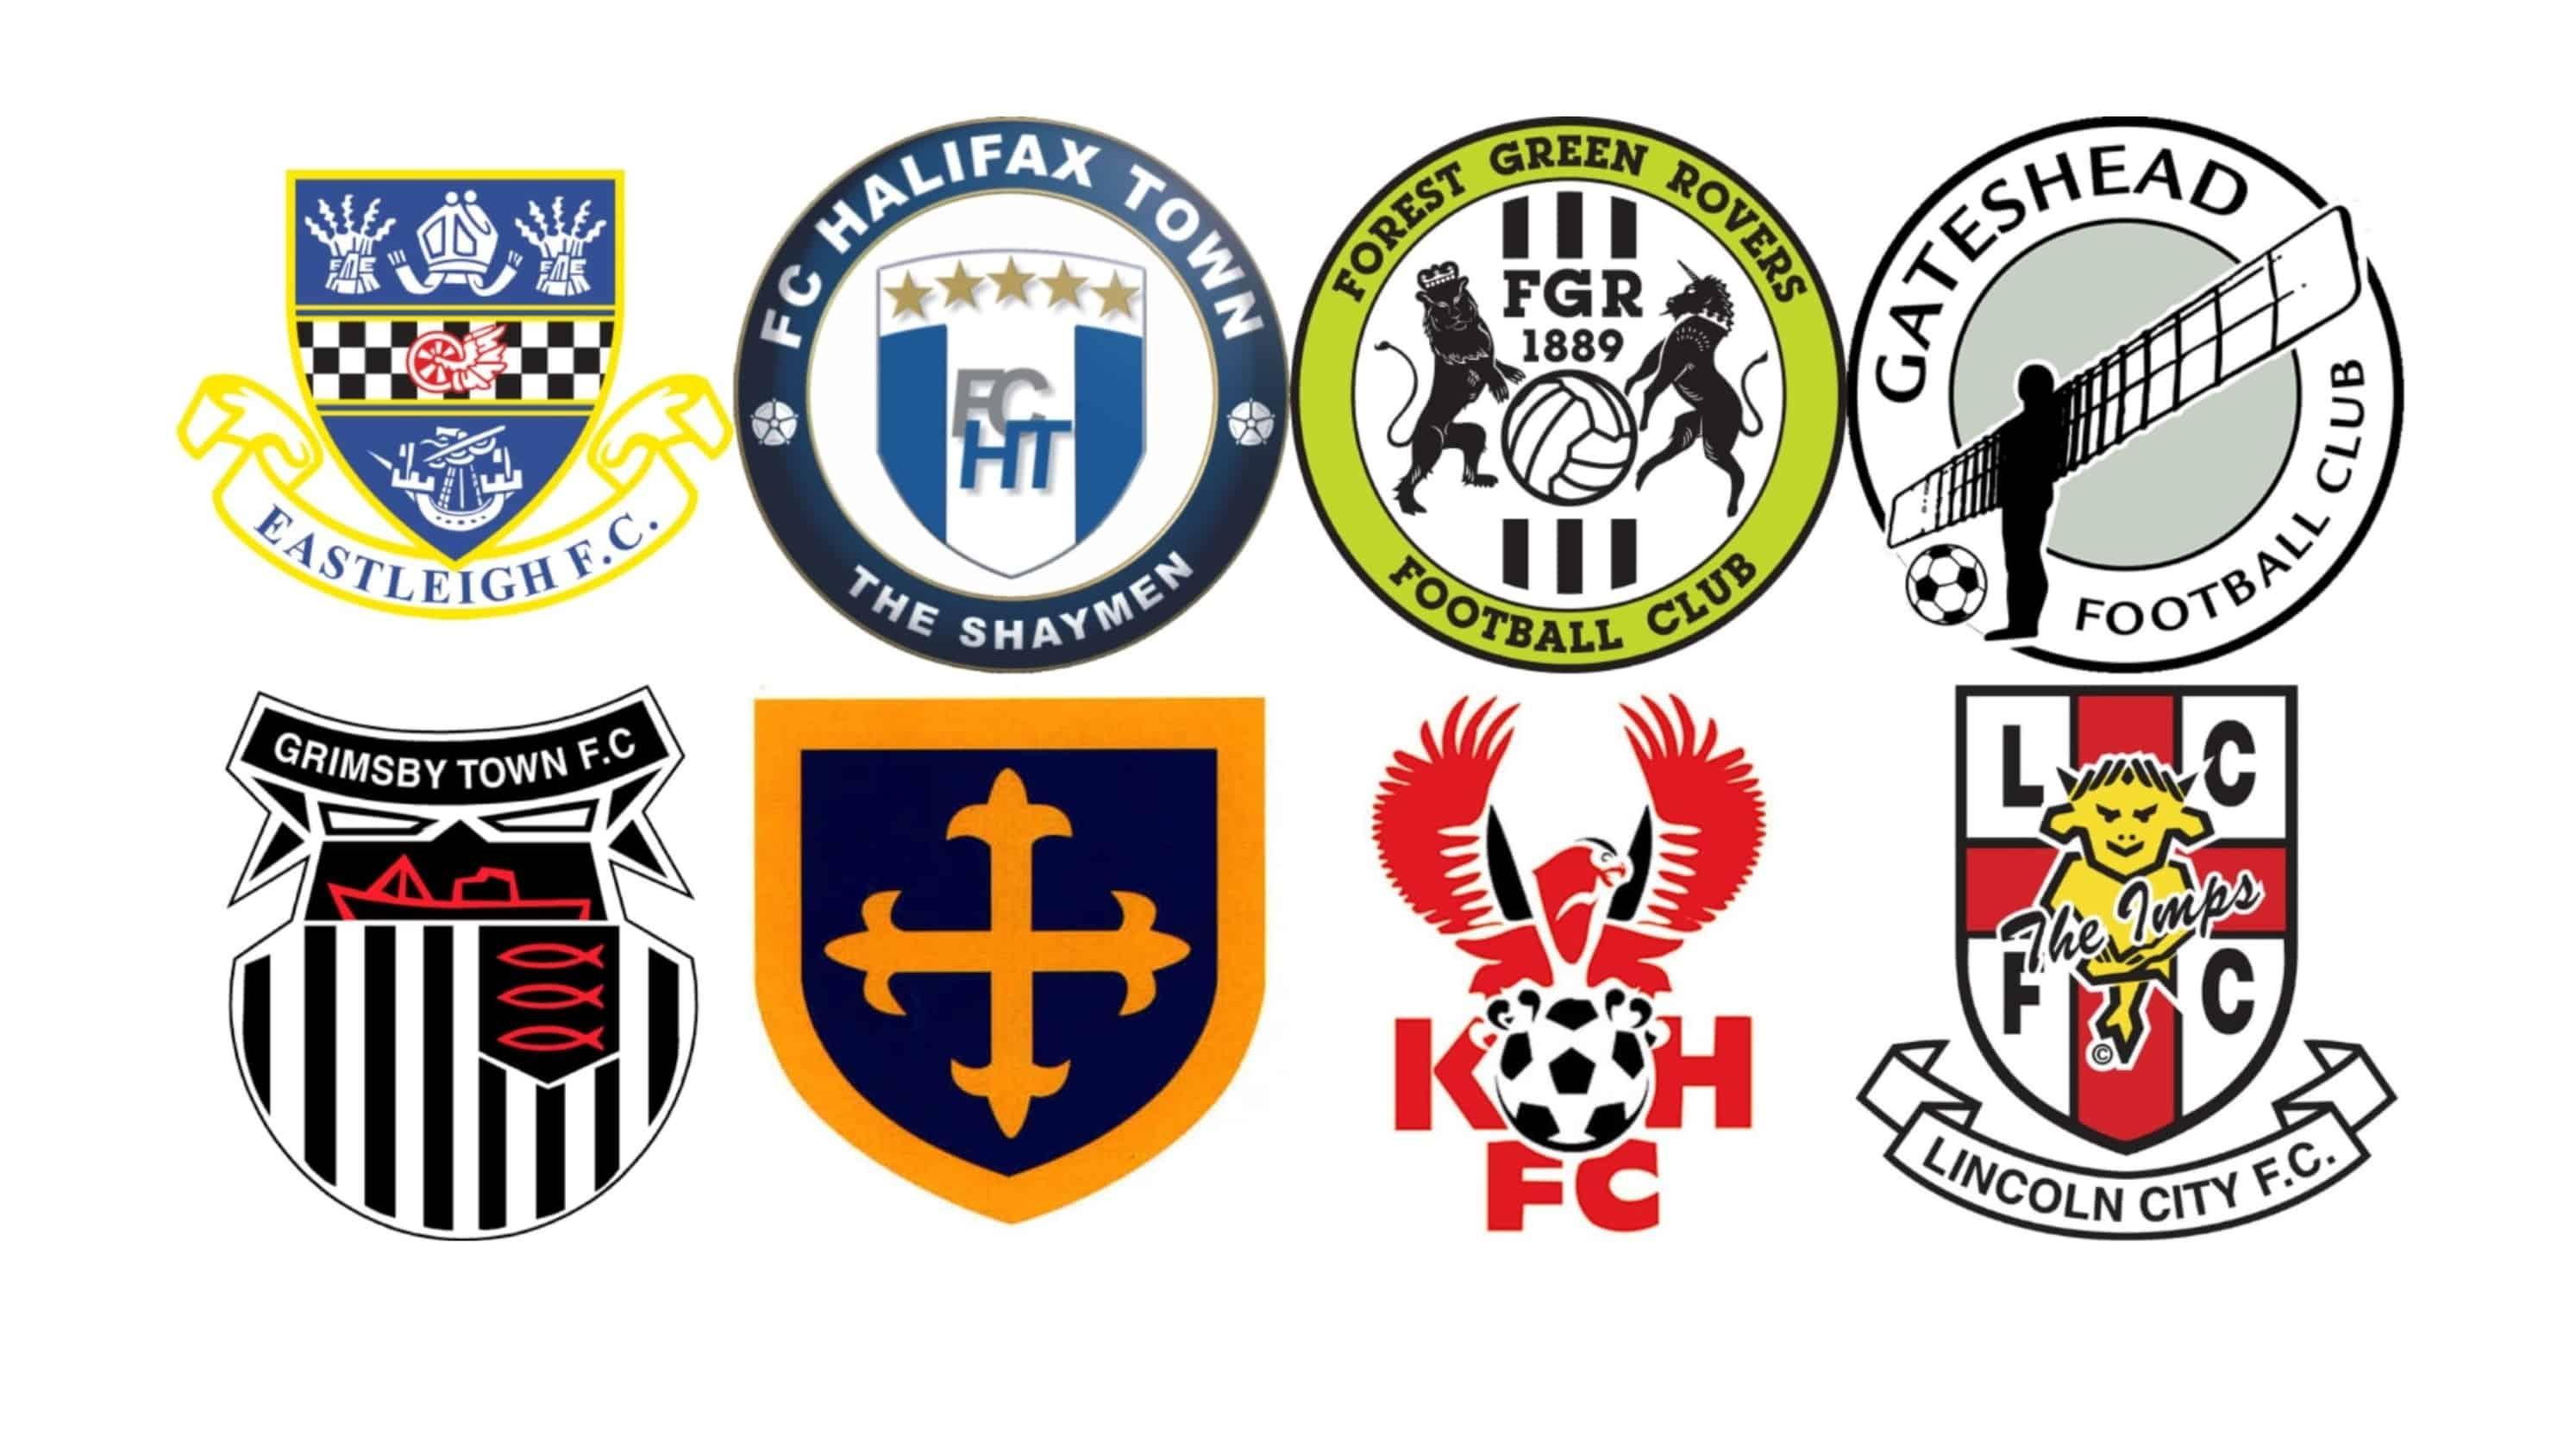 Vanarama National League 2015-16, part 2 | Aldershot Town FC